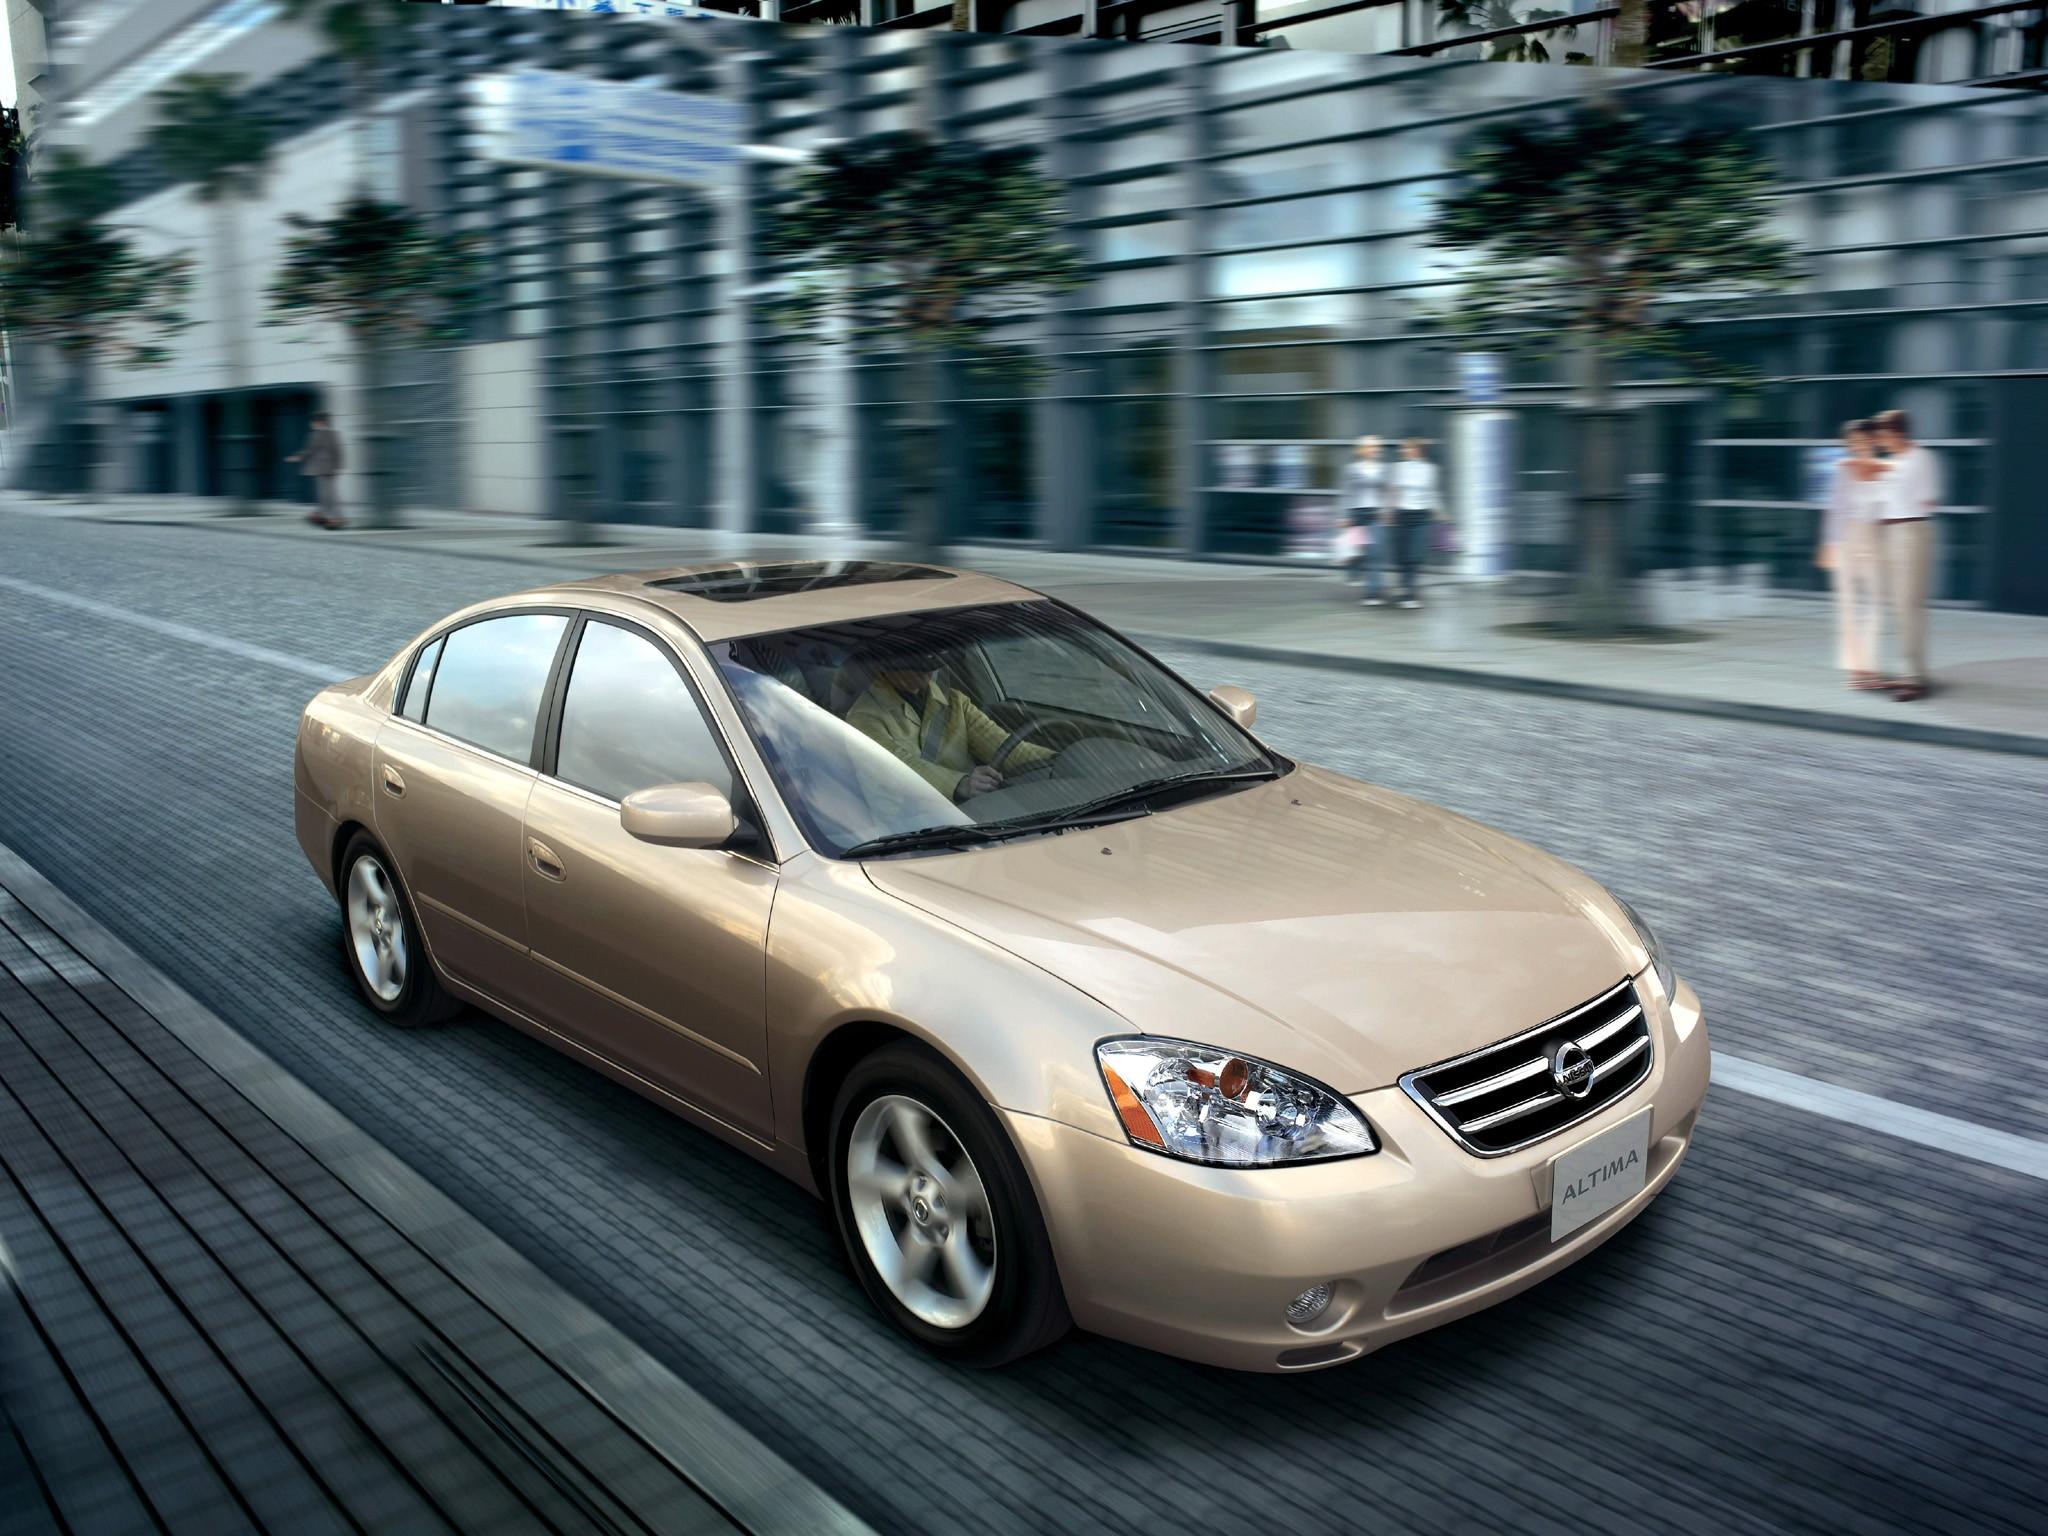 2005 Nissan Altima 3.5 Se R >> NISSAN Altima specs & photos - 2002, 2003, 2004, 2005, 2006 - autoevolution